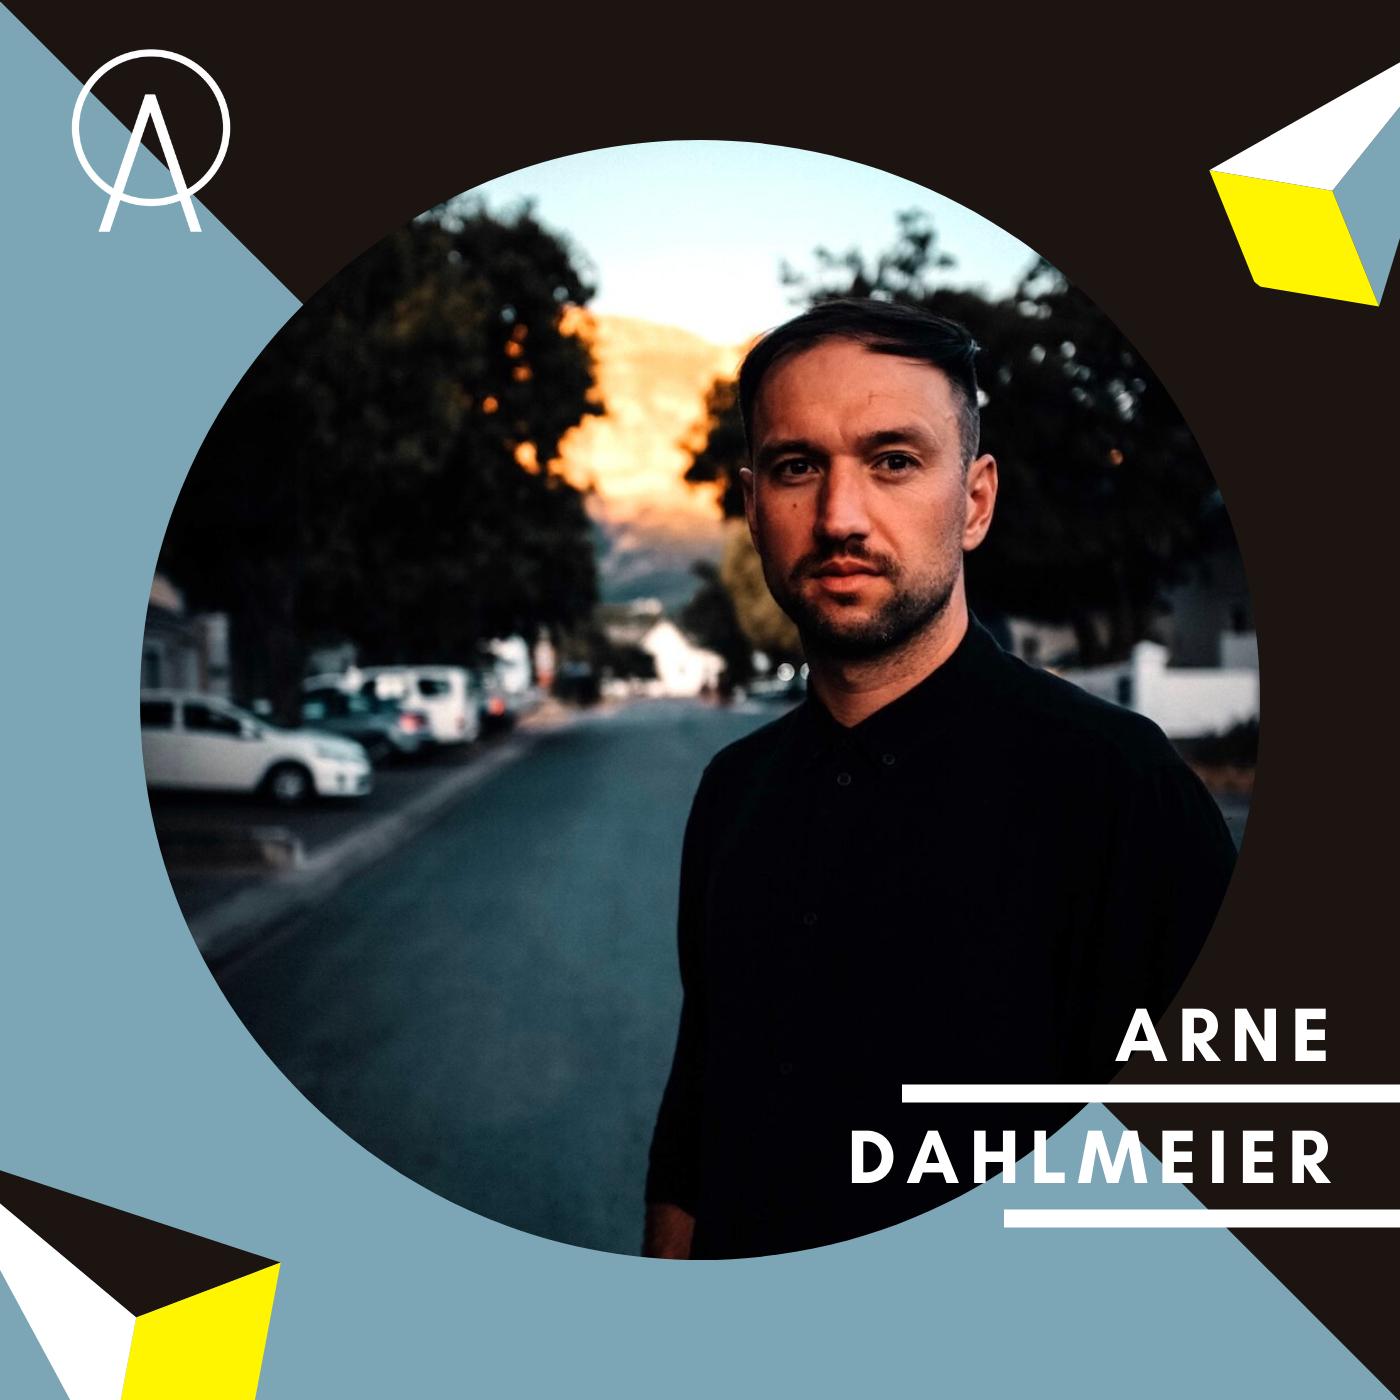 Unterm Strich Folge #001: Reisevermittler Arne Dahlmeier